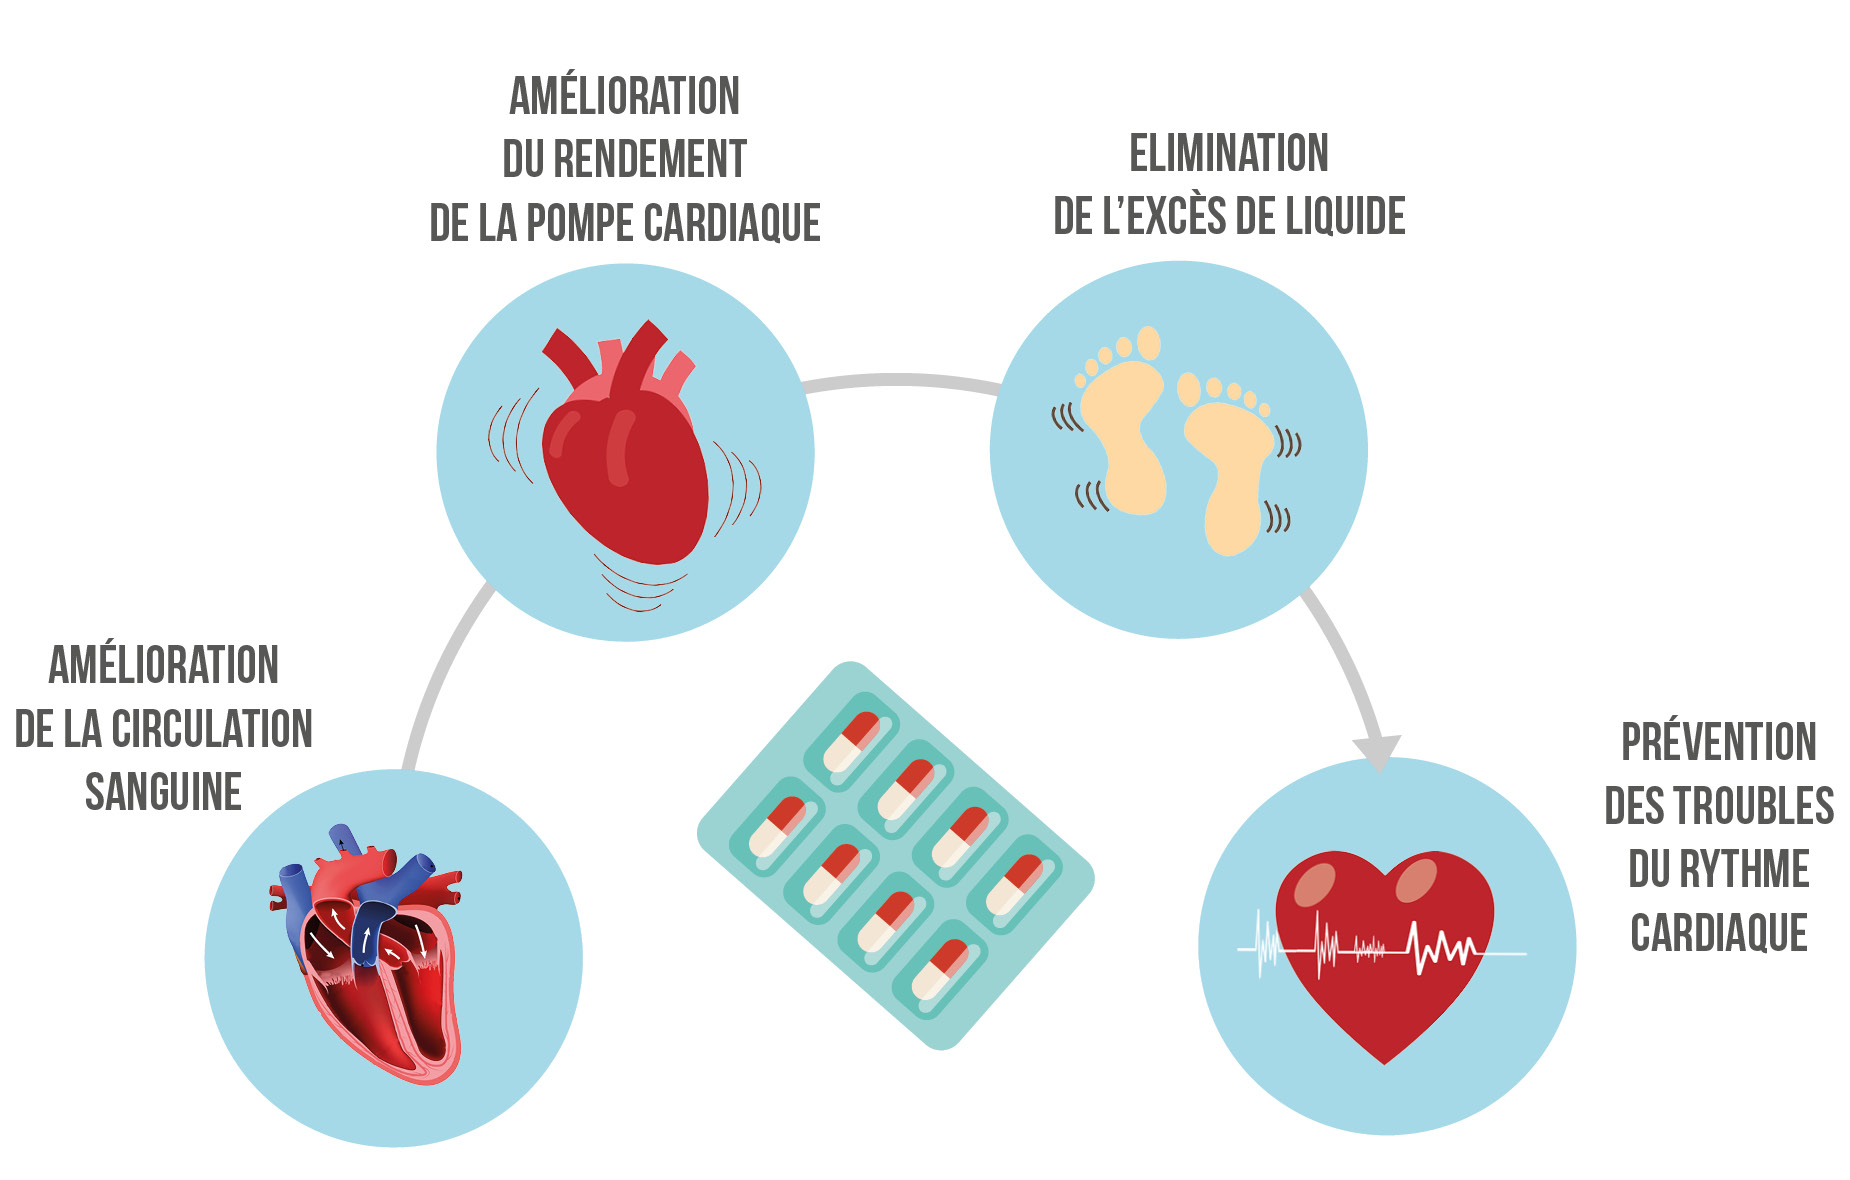 amelioration de la circulation sanguine